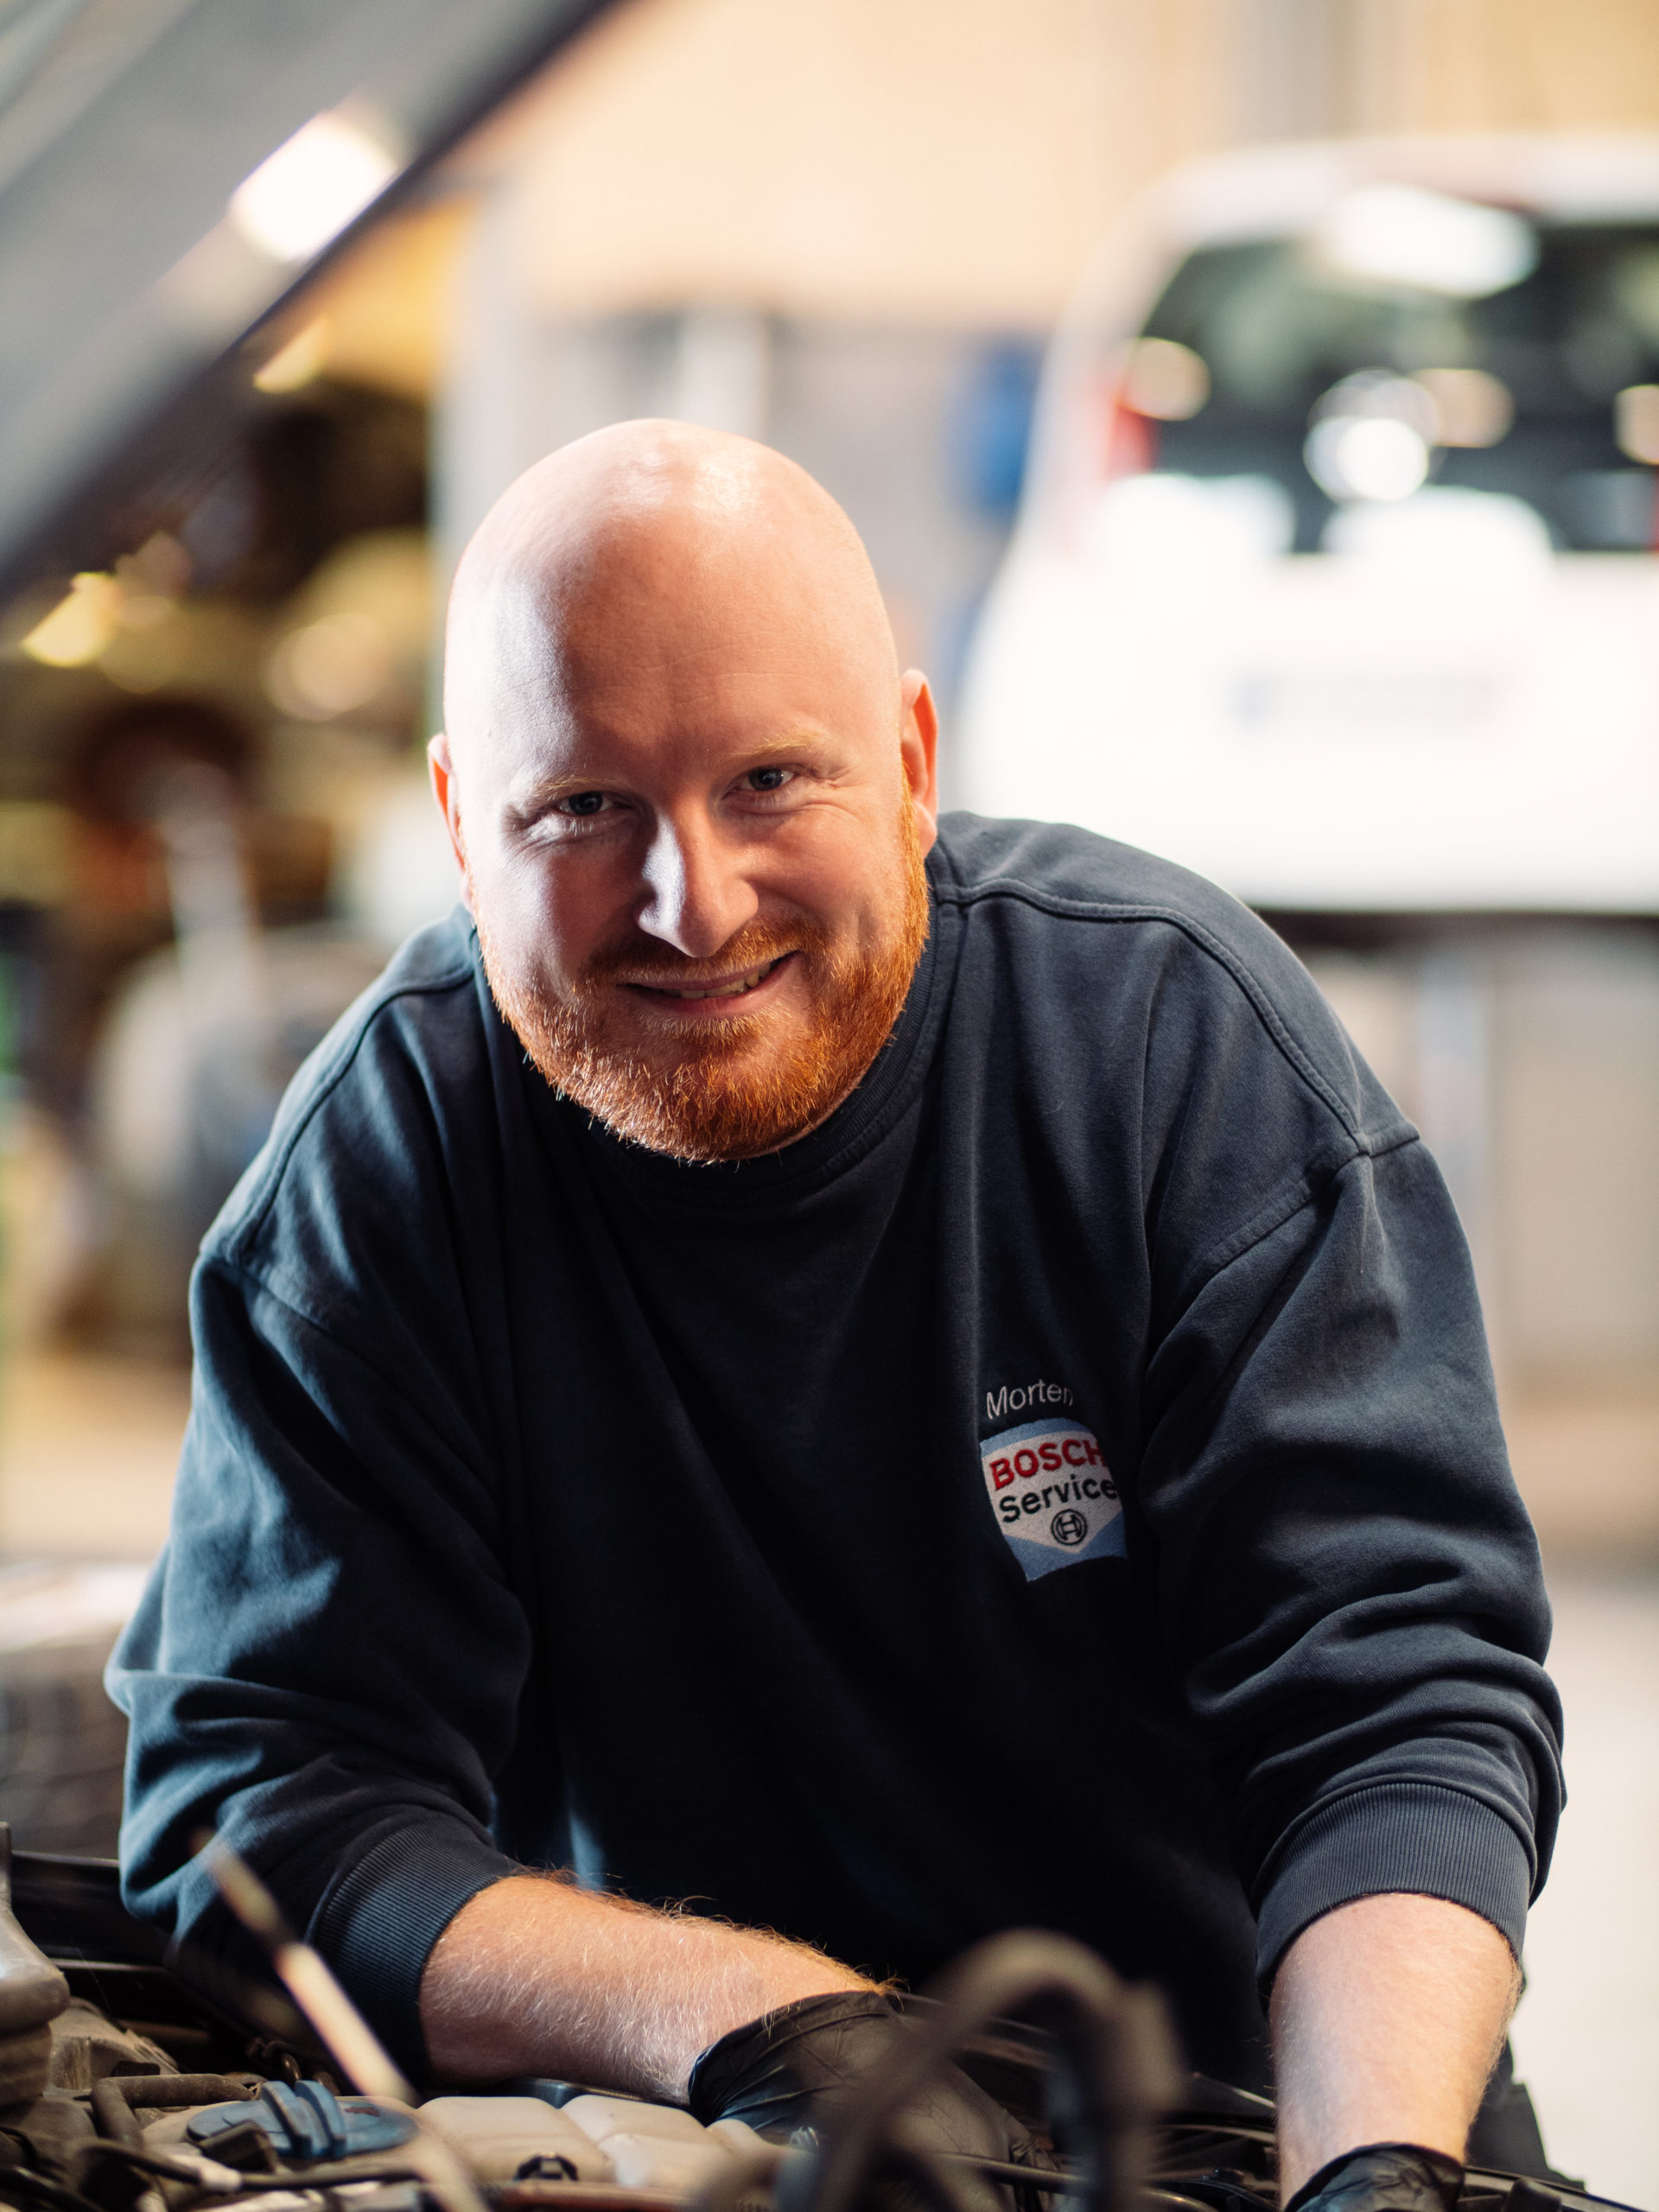 Morten Grøn Rasmussen